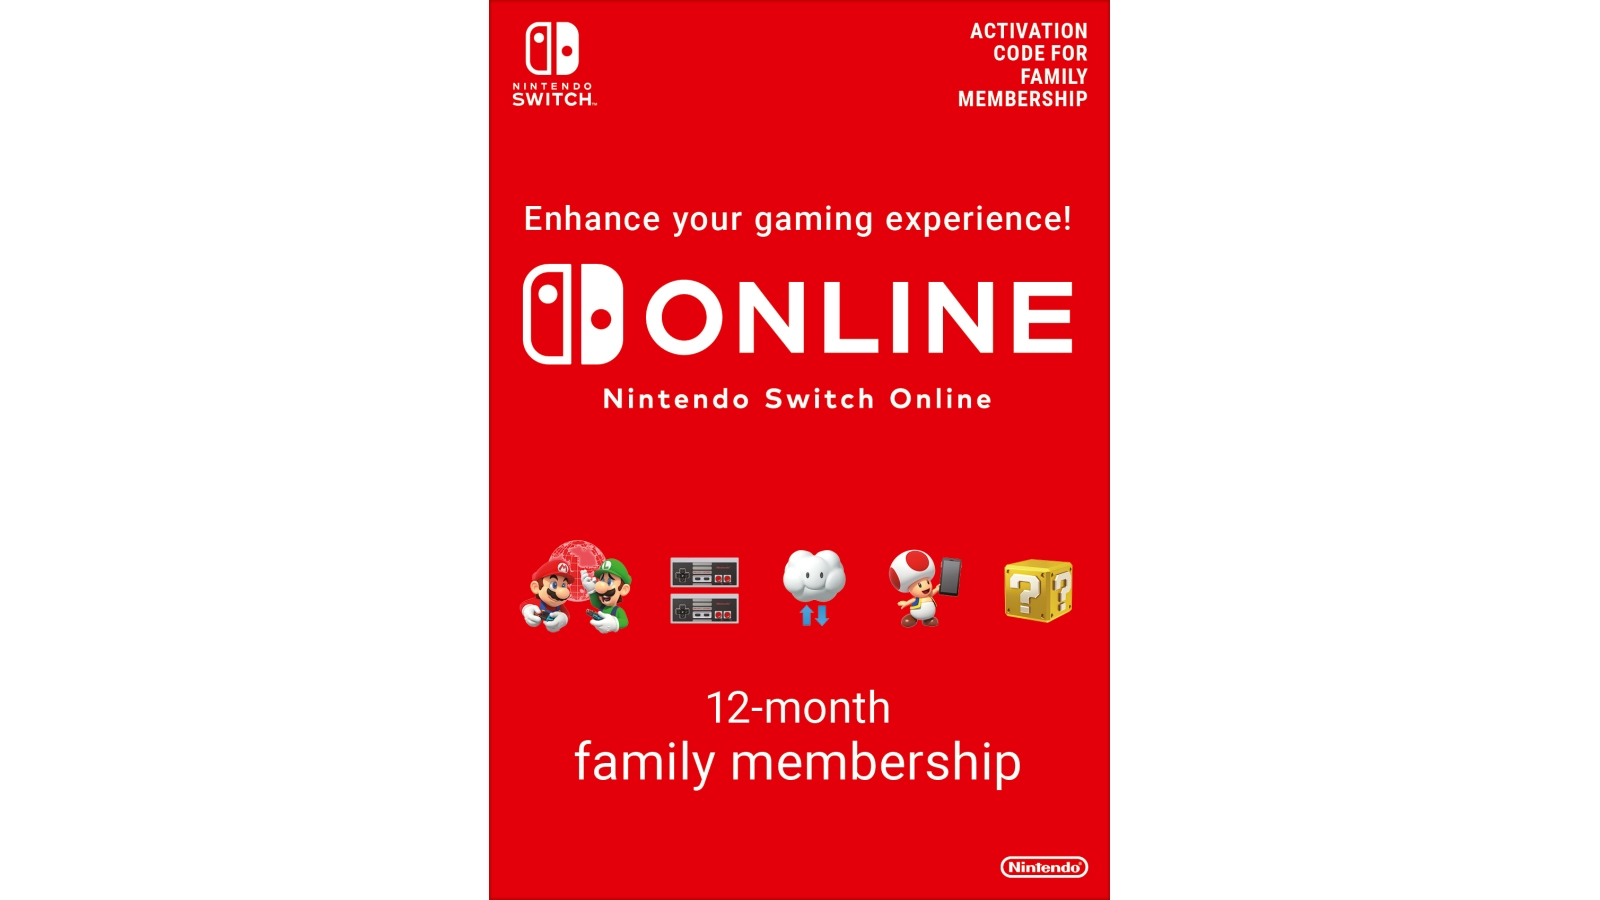 נינטנדו סוויץ' אונליין - Nintendo Switch Online - מנוי משפחתי 365 יום